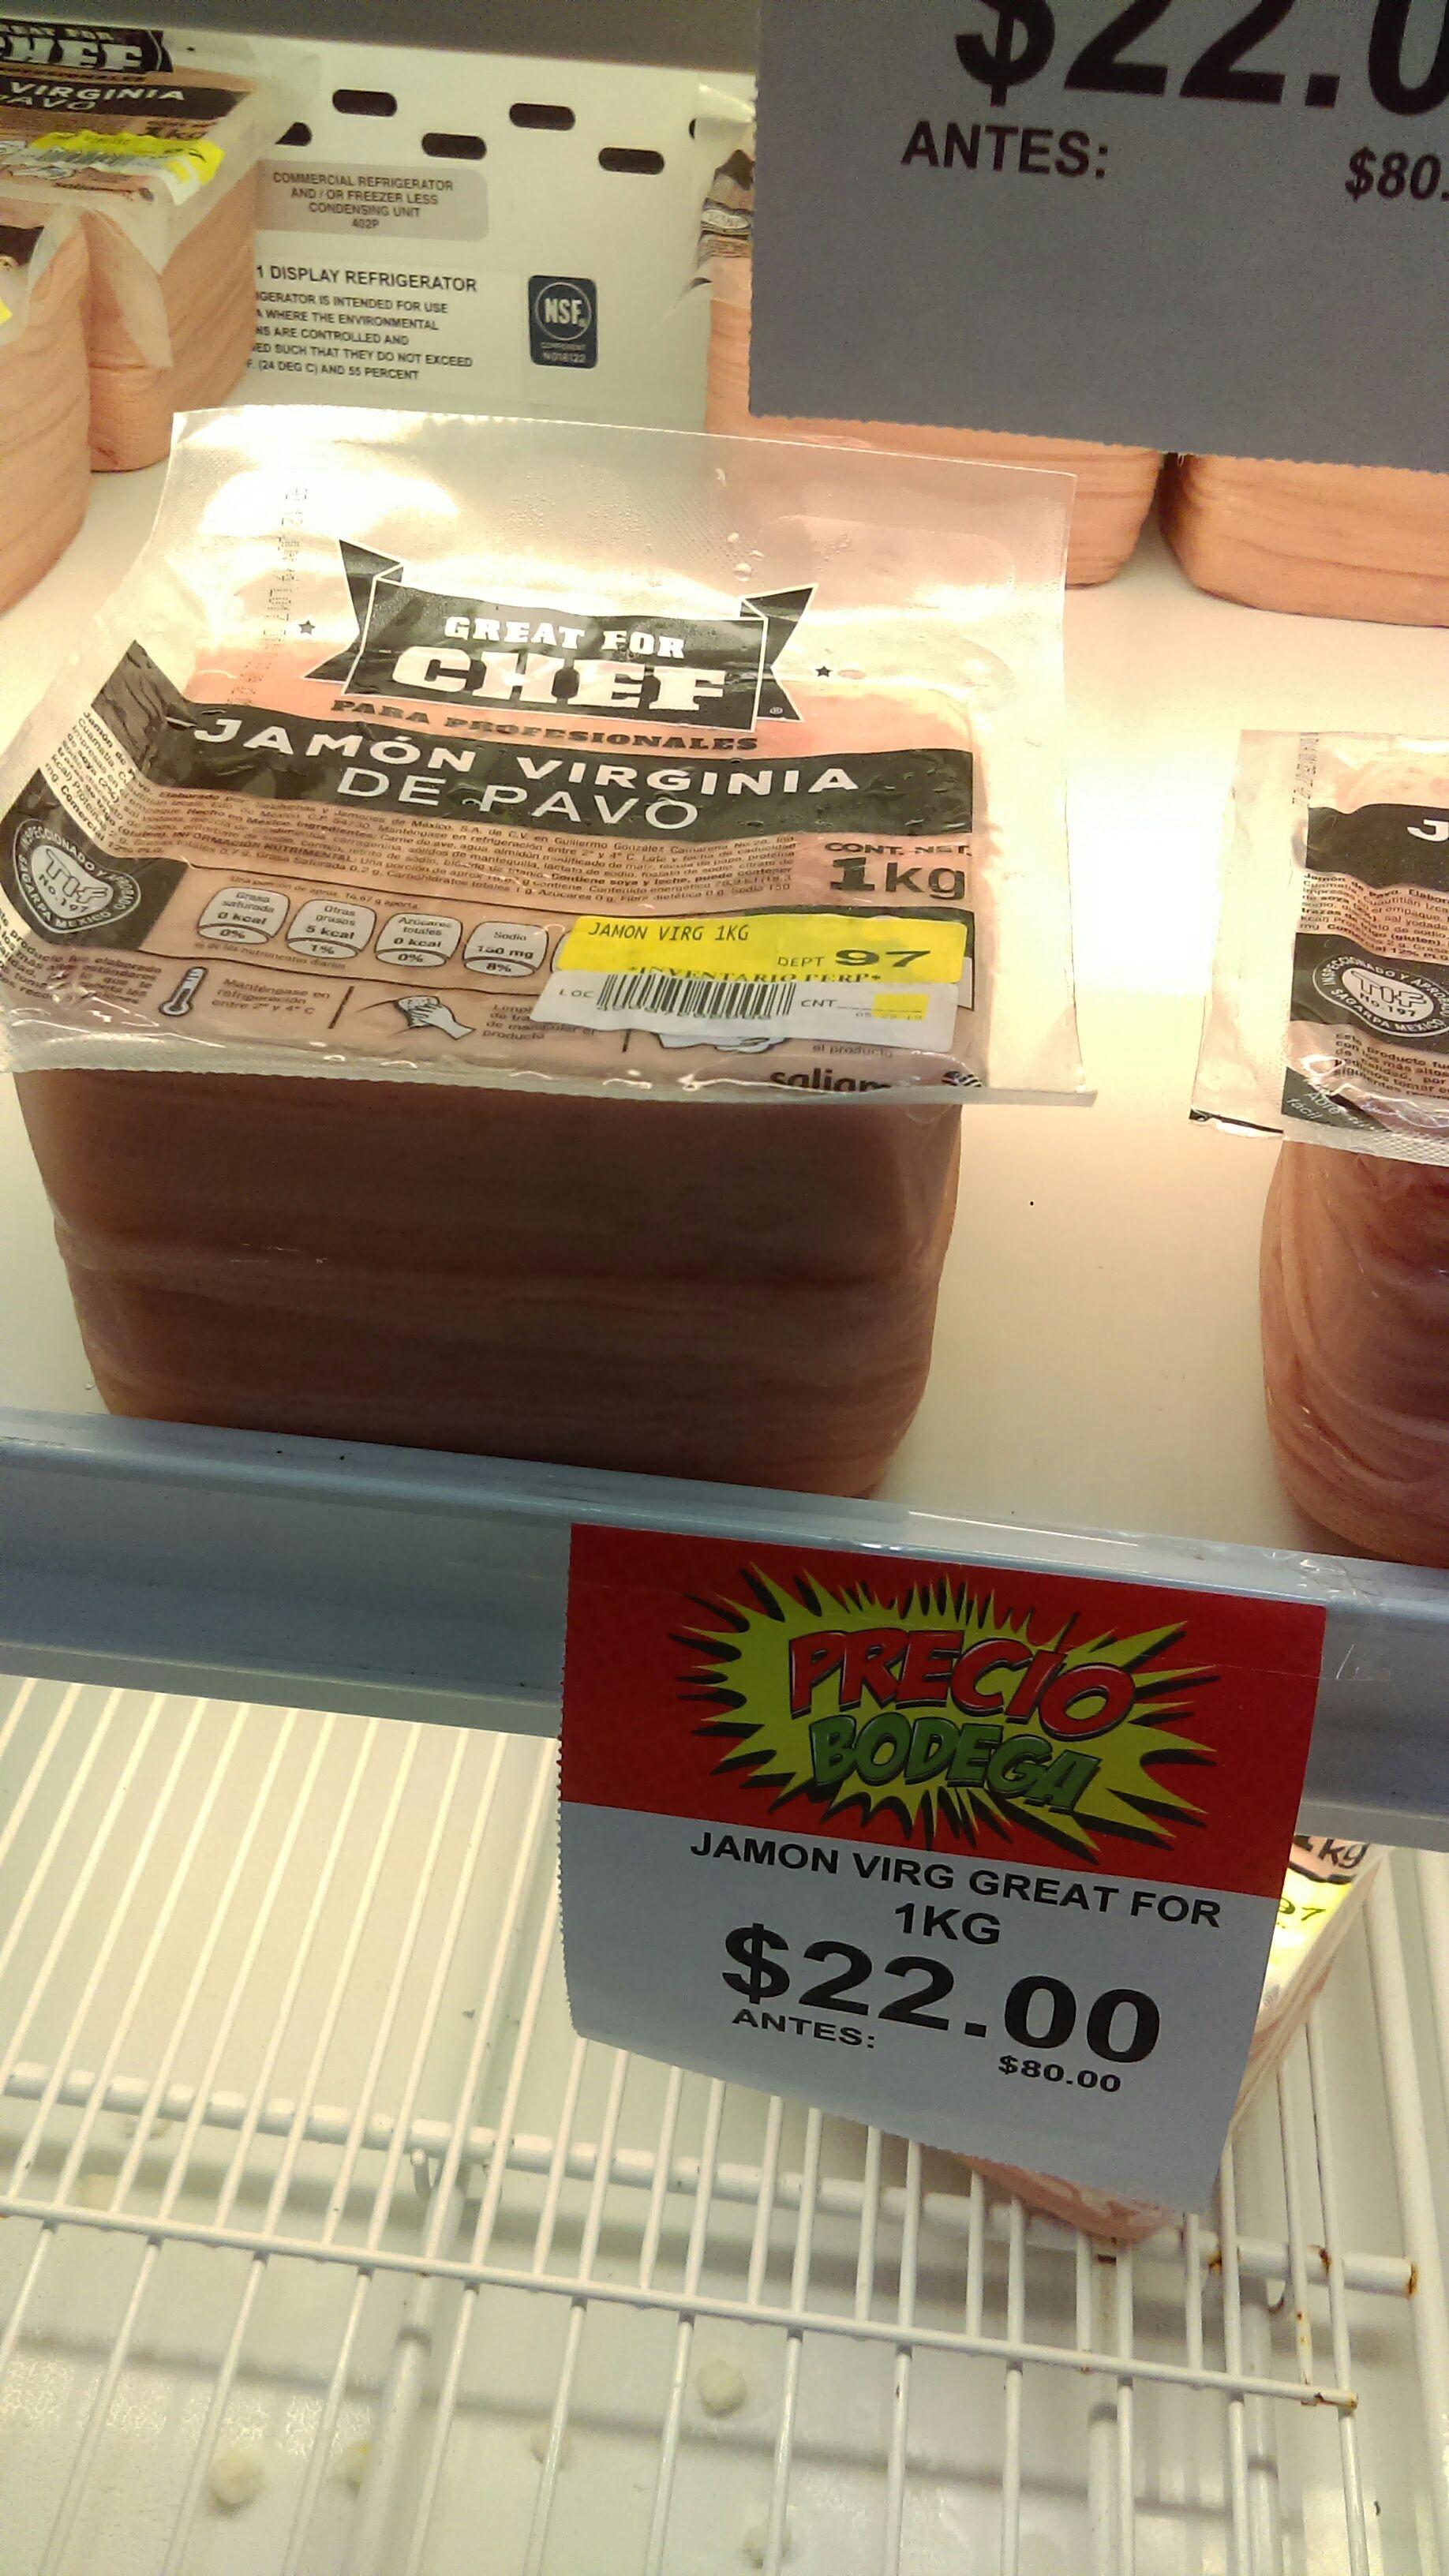 Bodega Aurrera: 1 kilo de jamón Virginia Great for Chef